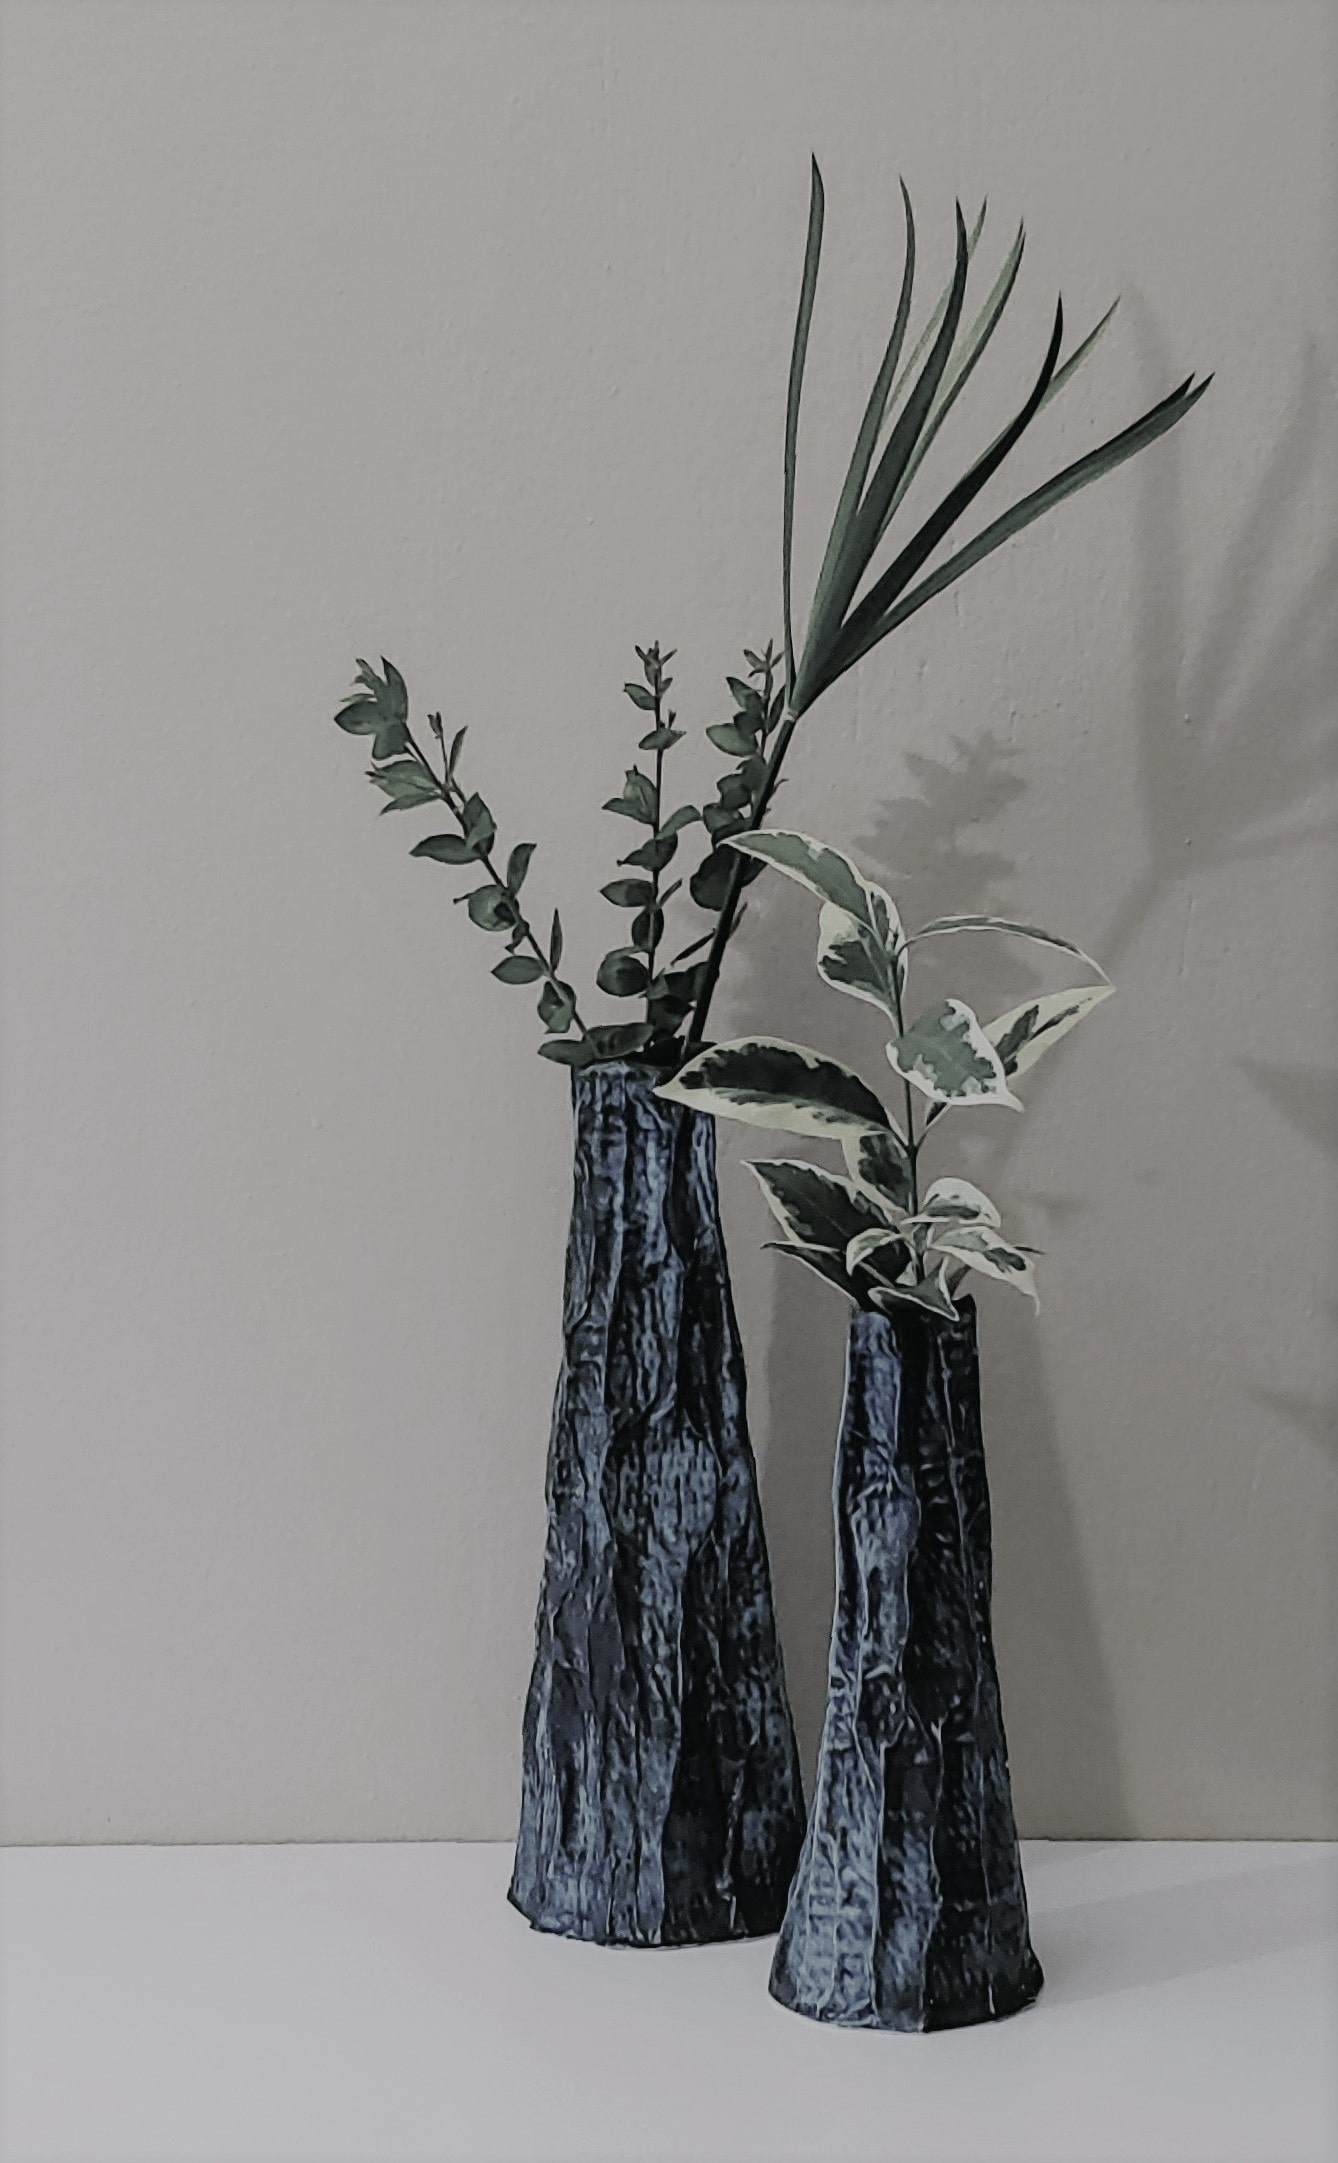 Roberta Barlati Highgreen 37+lowgreen 28earthenware2020